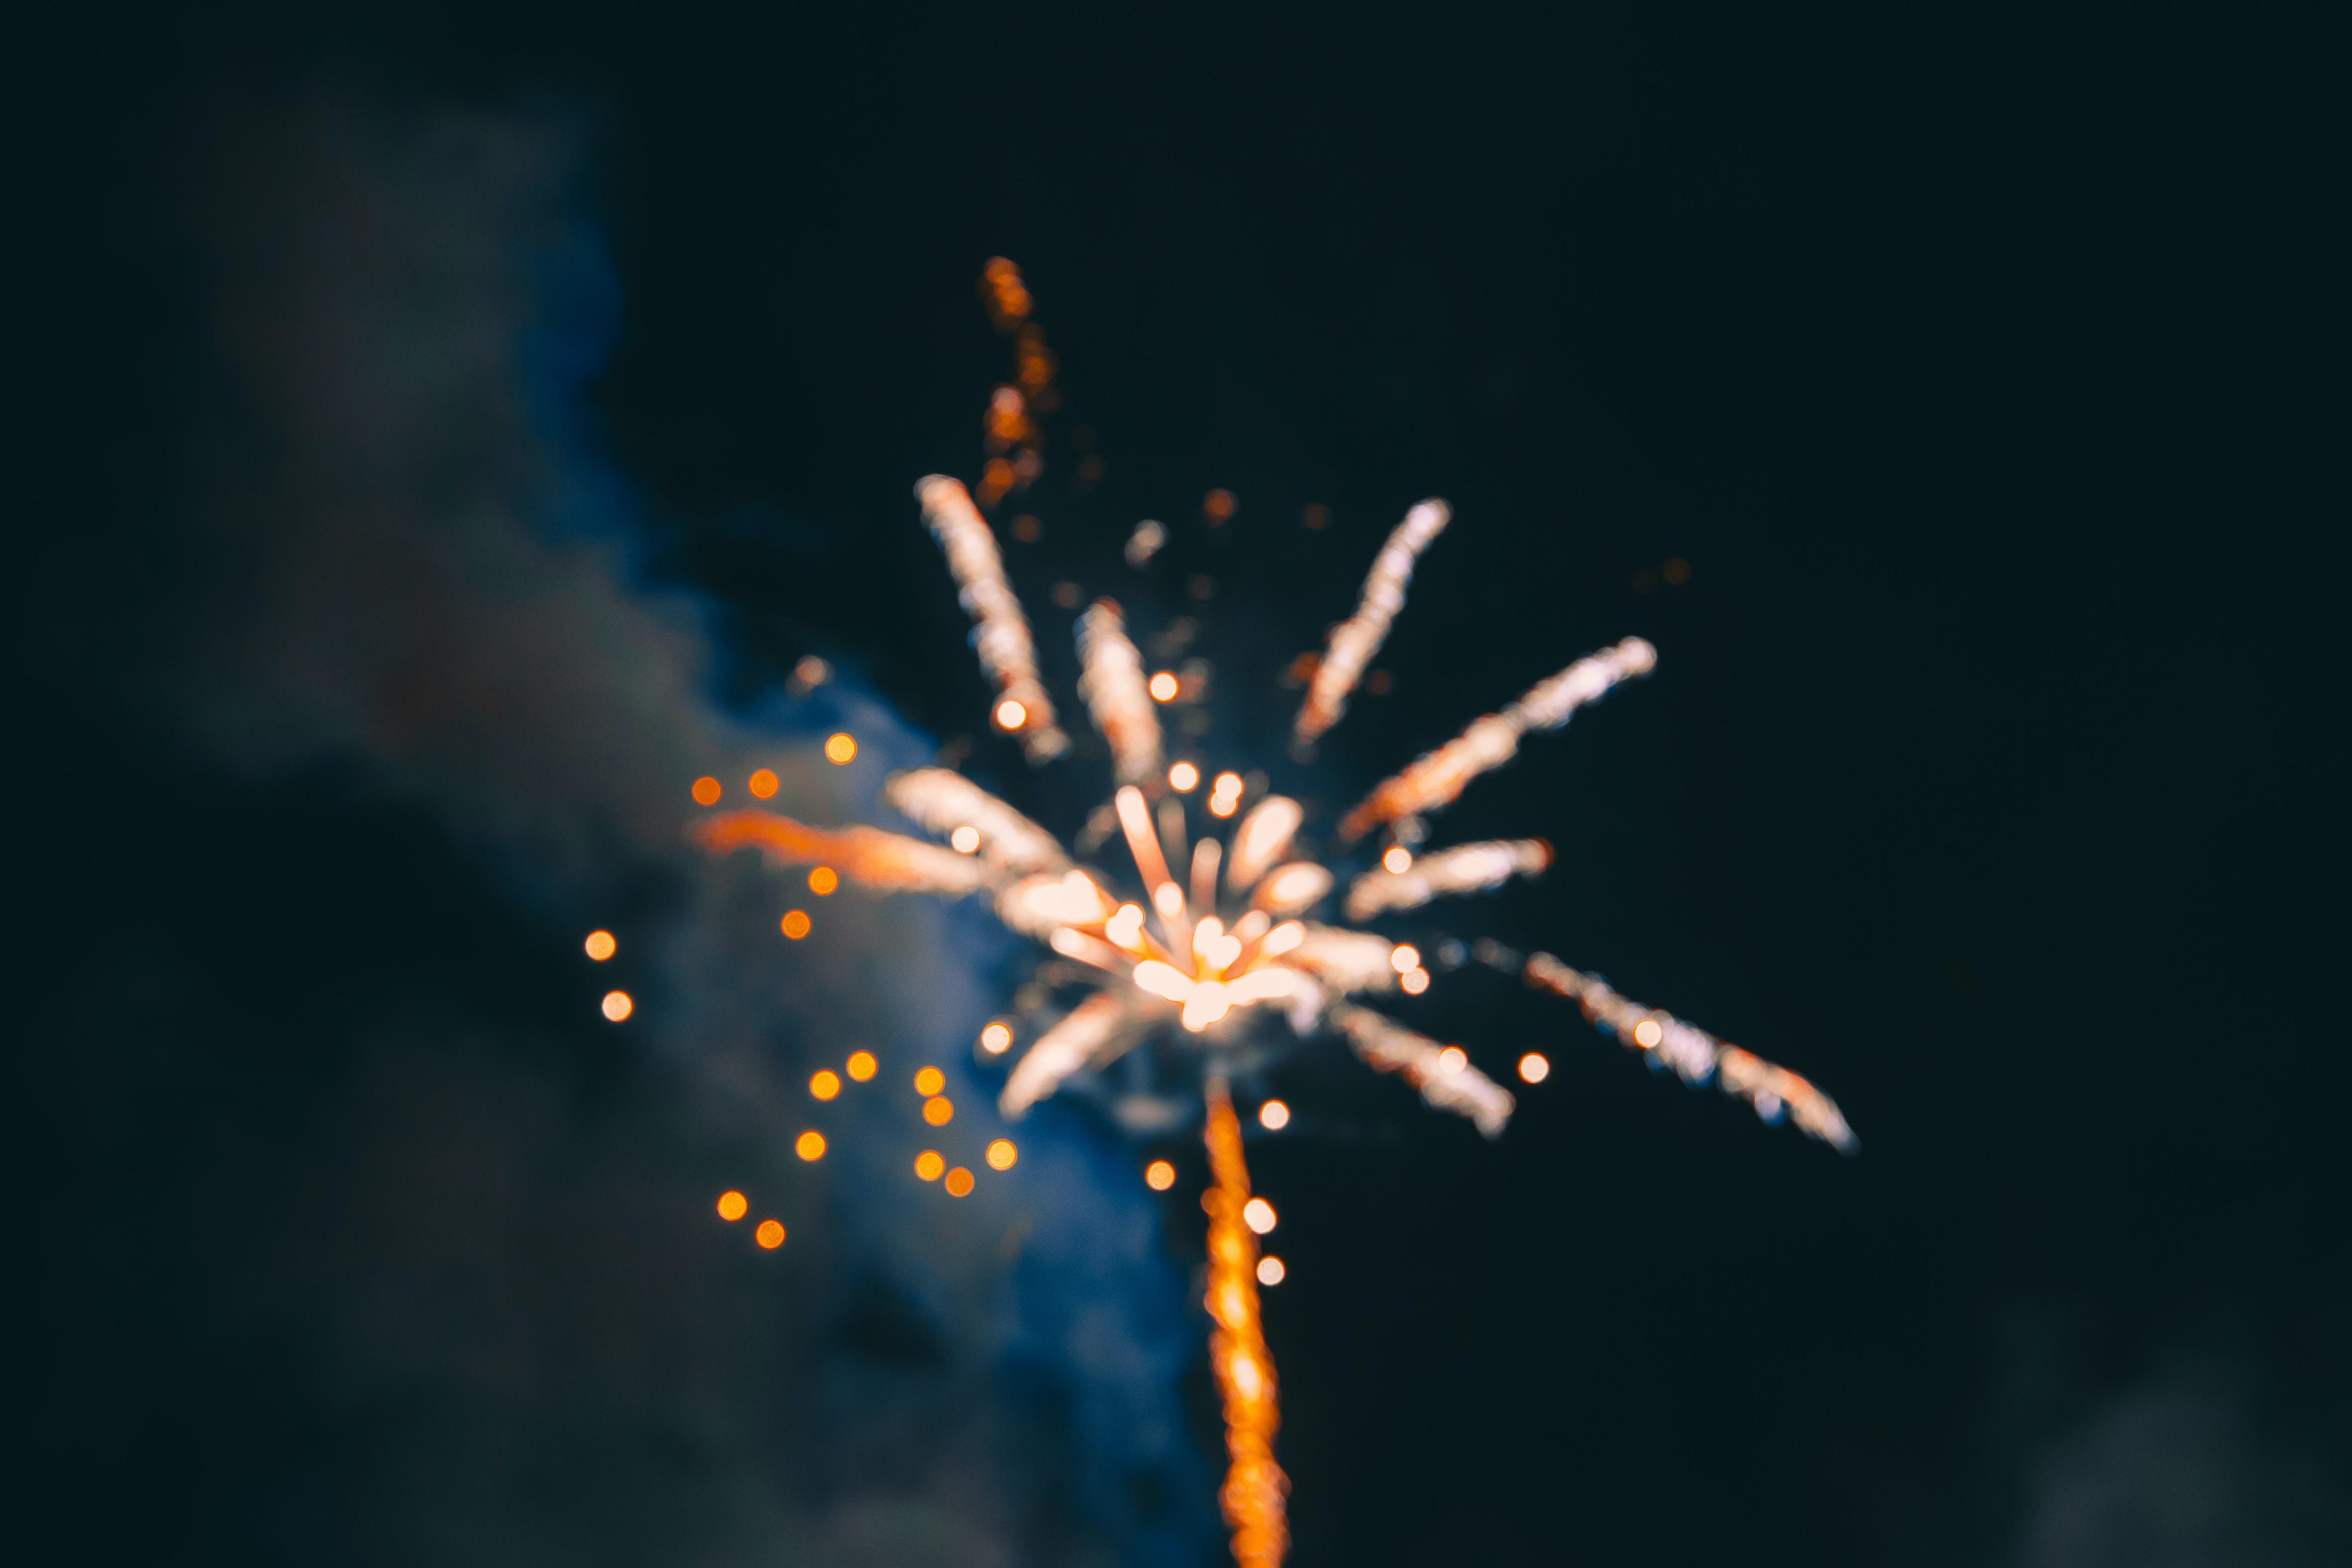 fireworks under cloudy sky